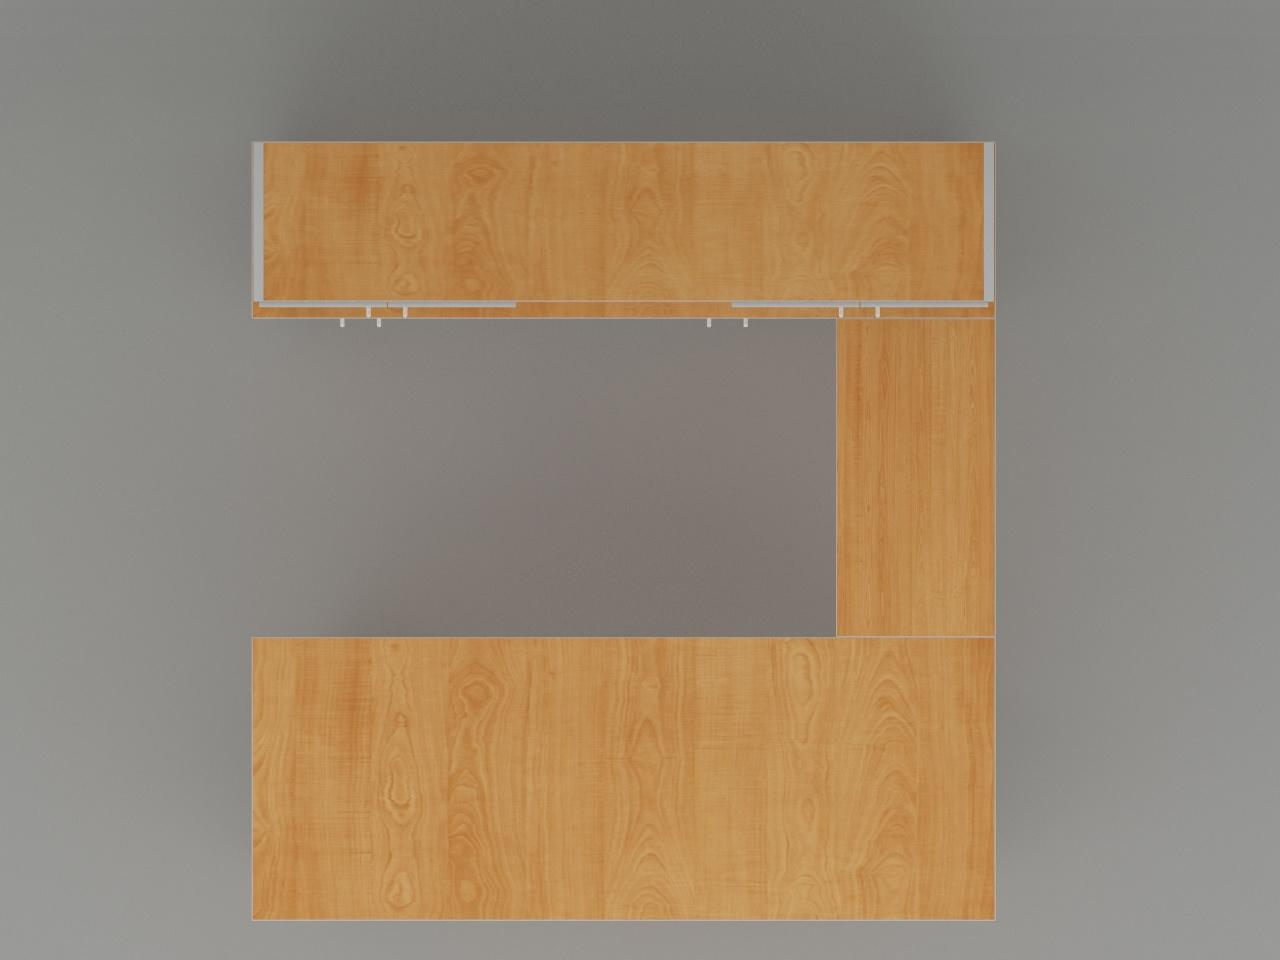 conjunto director kupch 210 x 220 cm